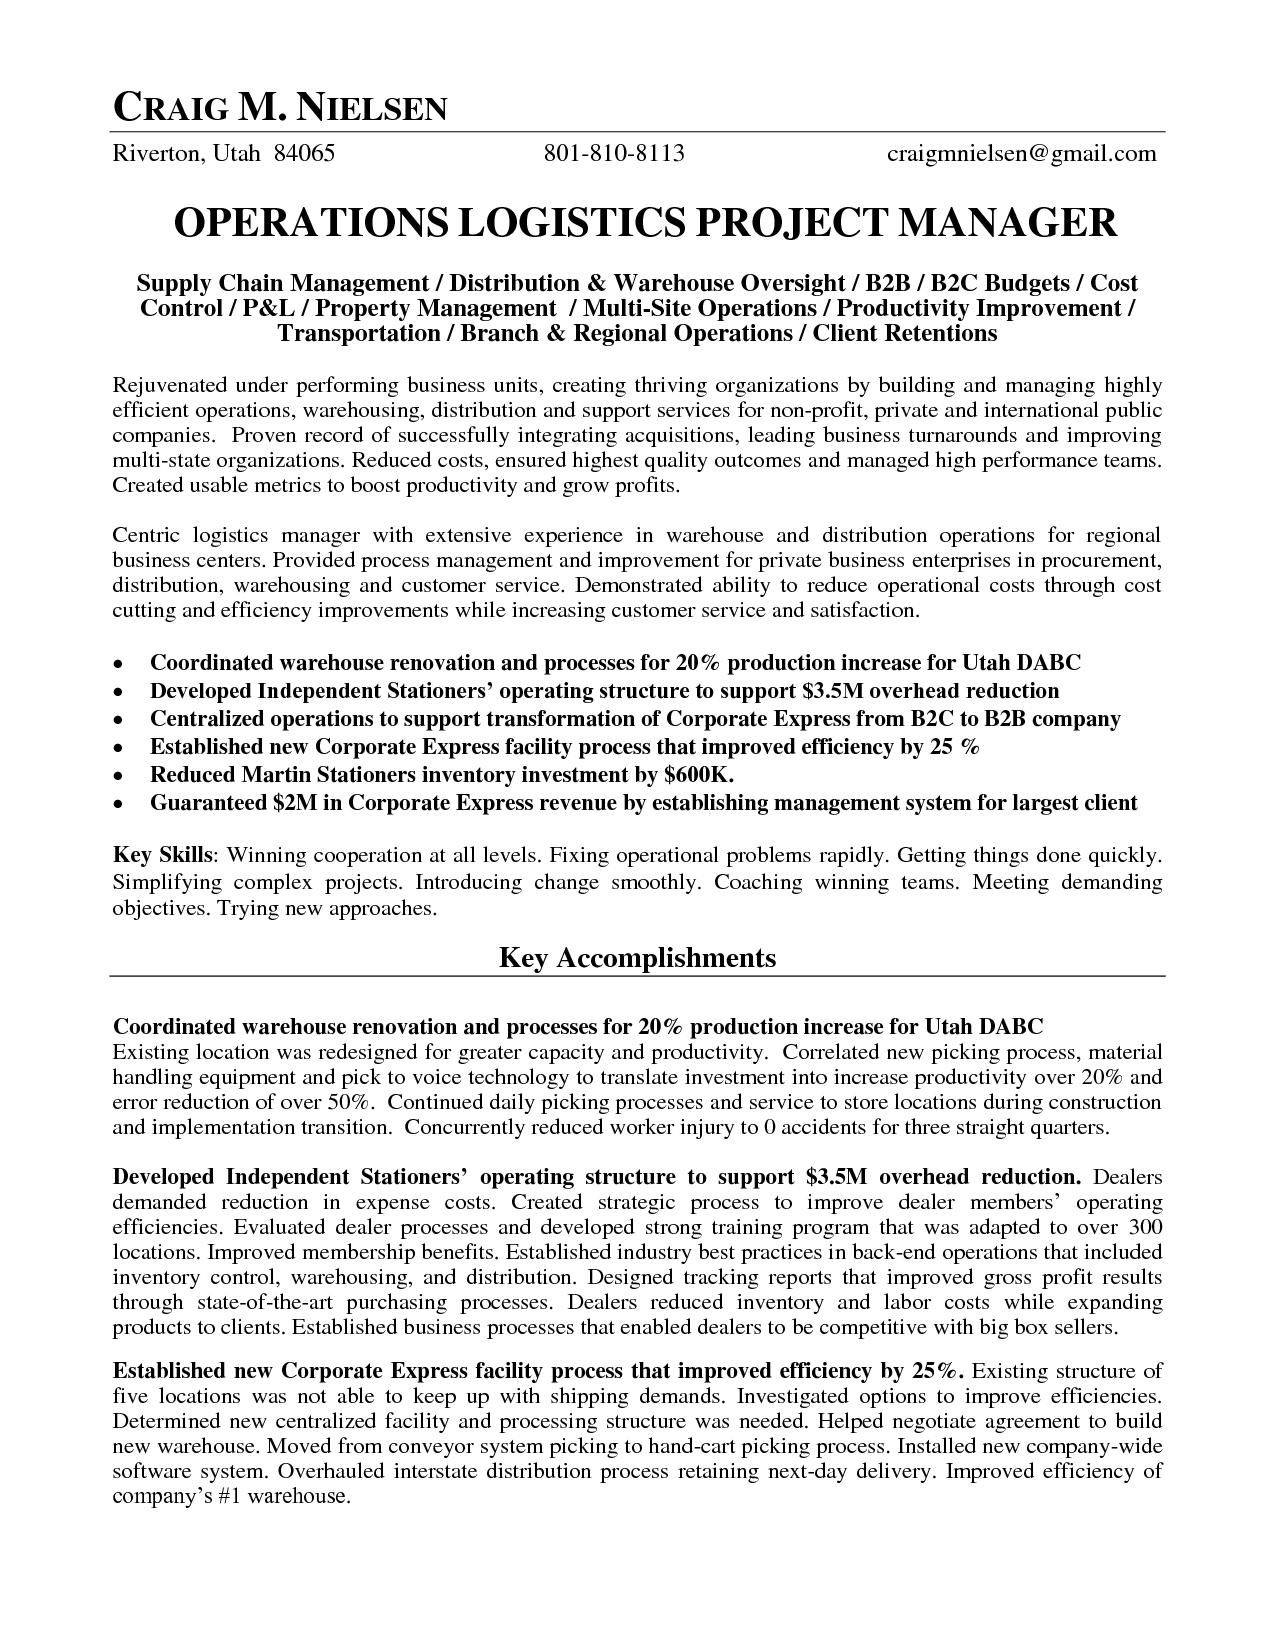 Logistics Operations Manager Resume